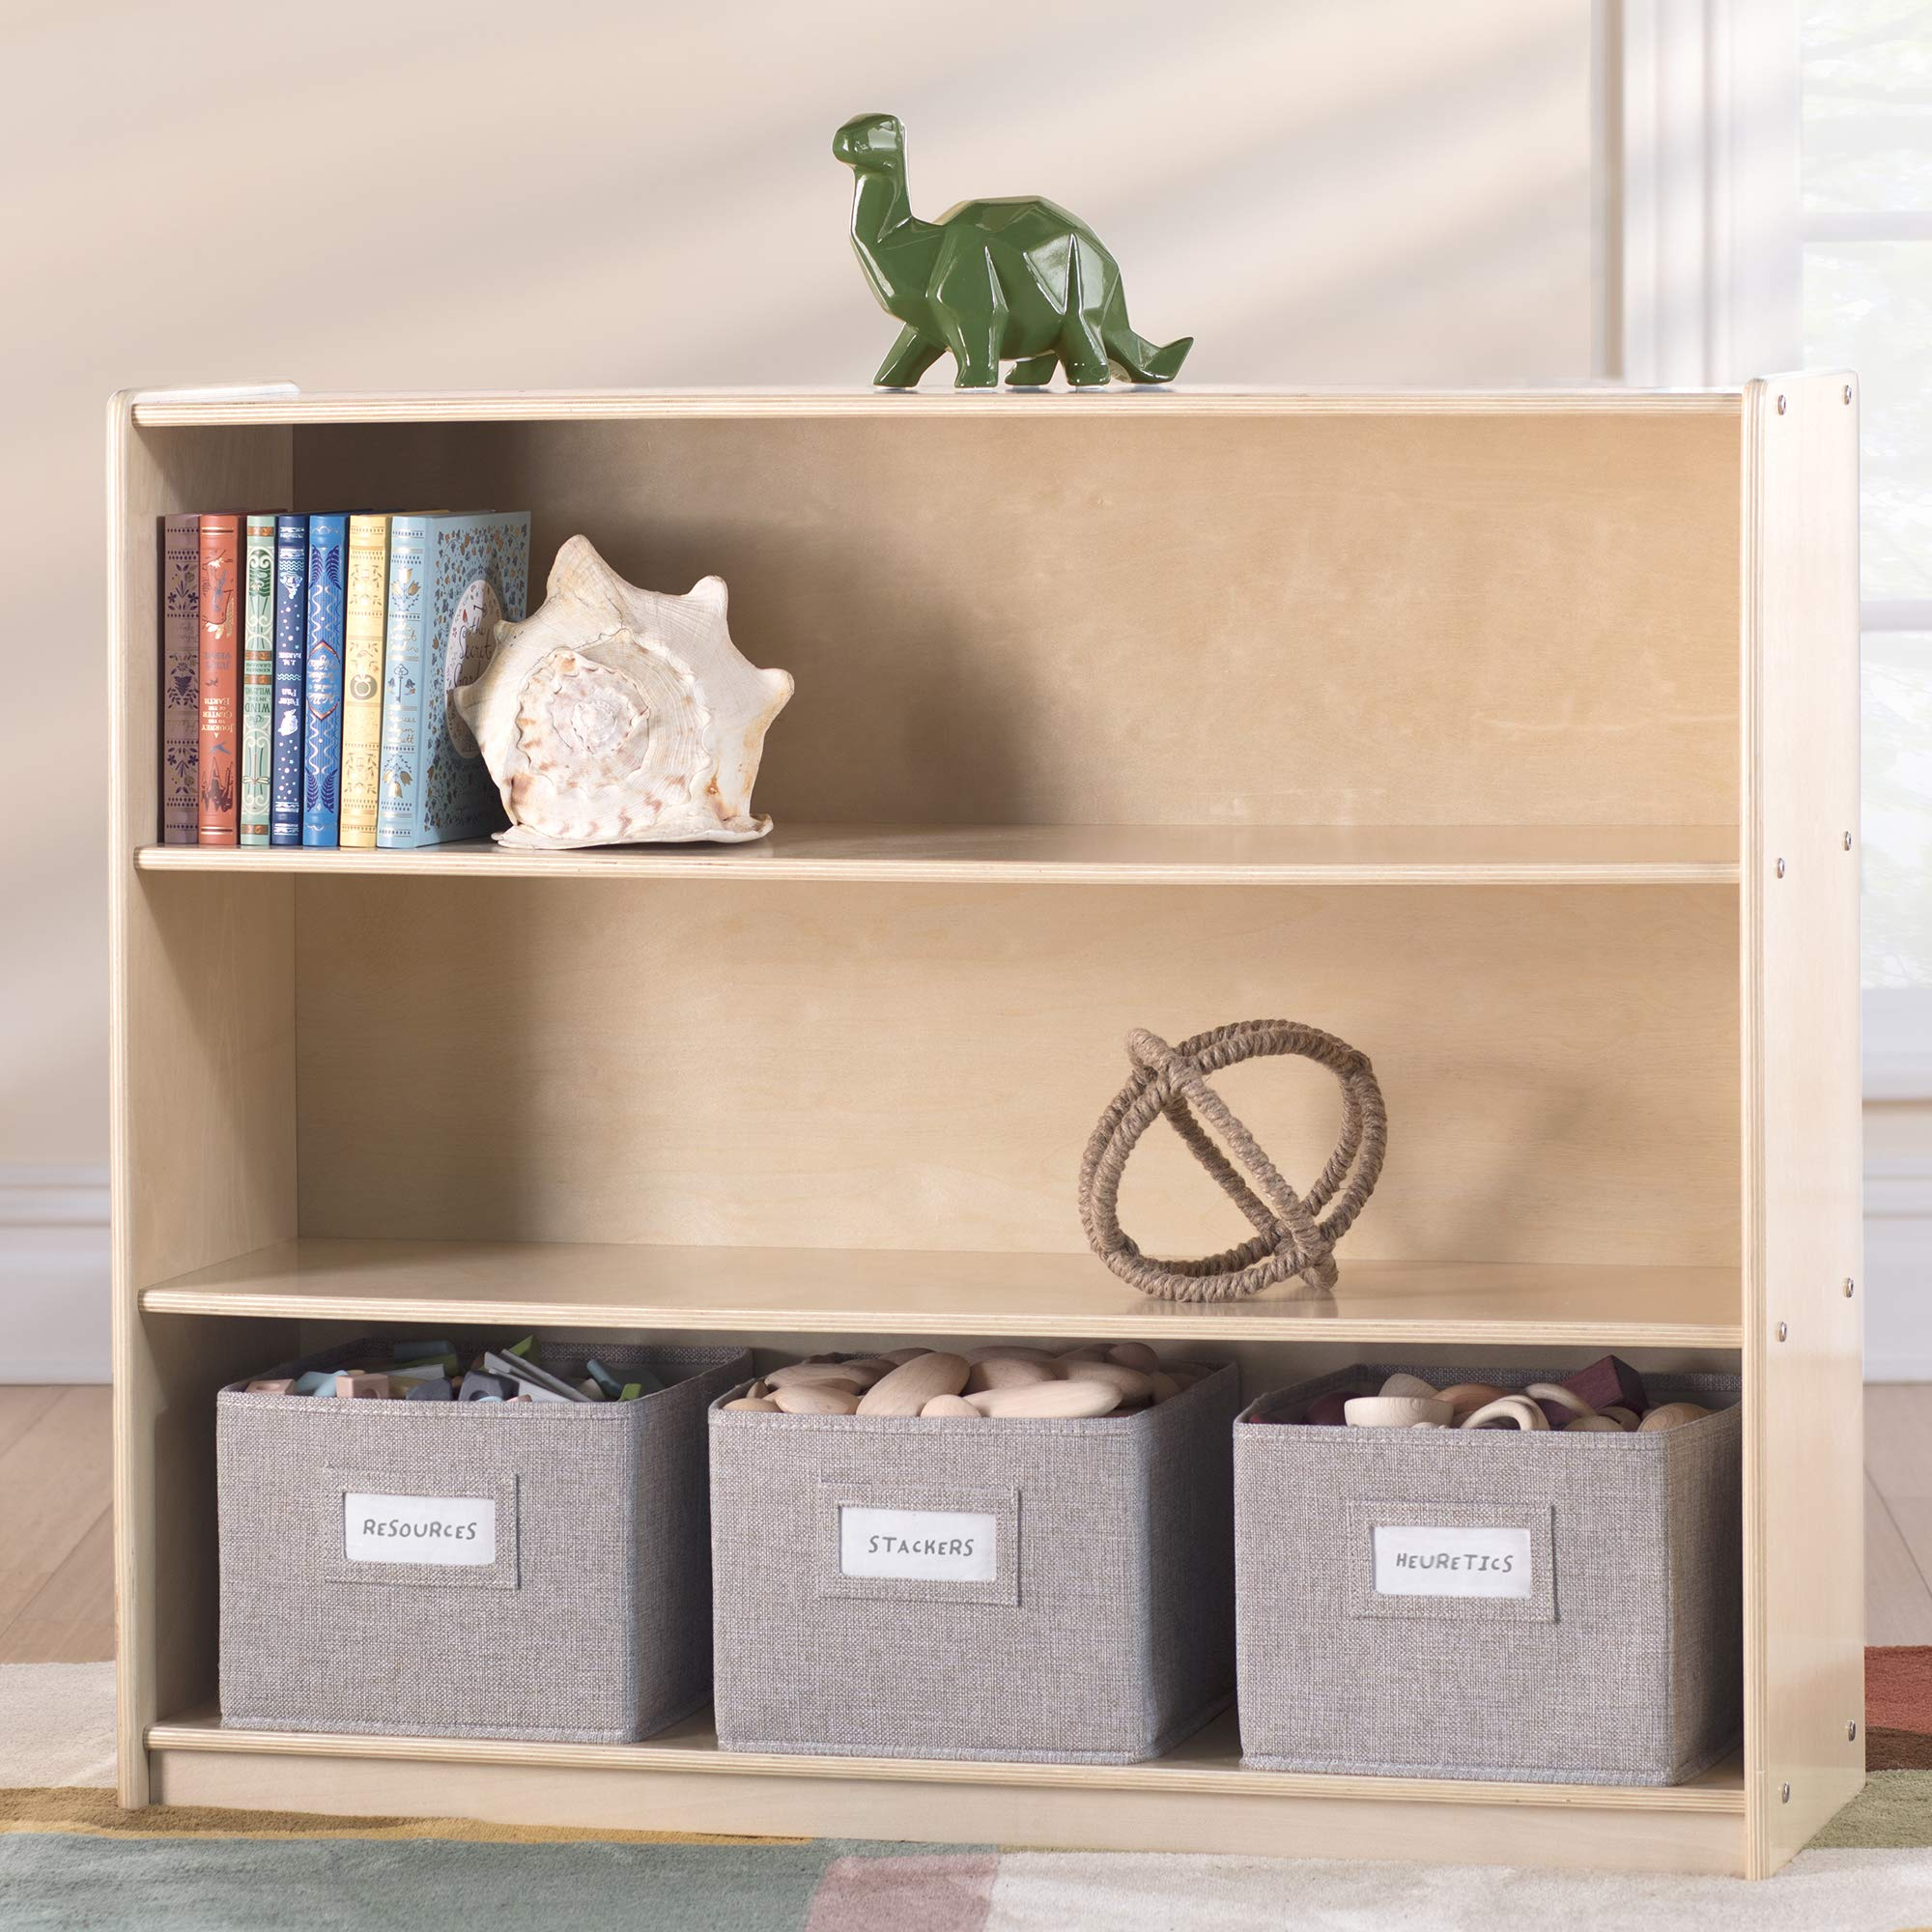 Guidecraft EdQ Essentials Three Shelf Open Storage Natural with 3 Fabric Bins: Wooden Kids Bookcases and Toy Storage Organizer; Homeschool and Classroom Furniture